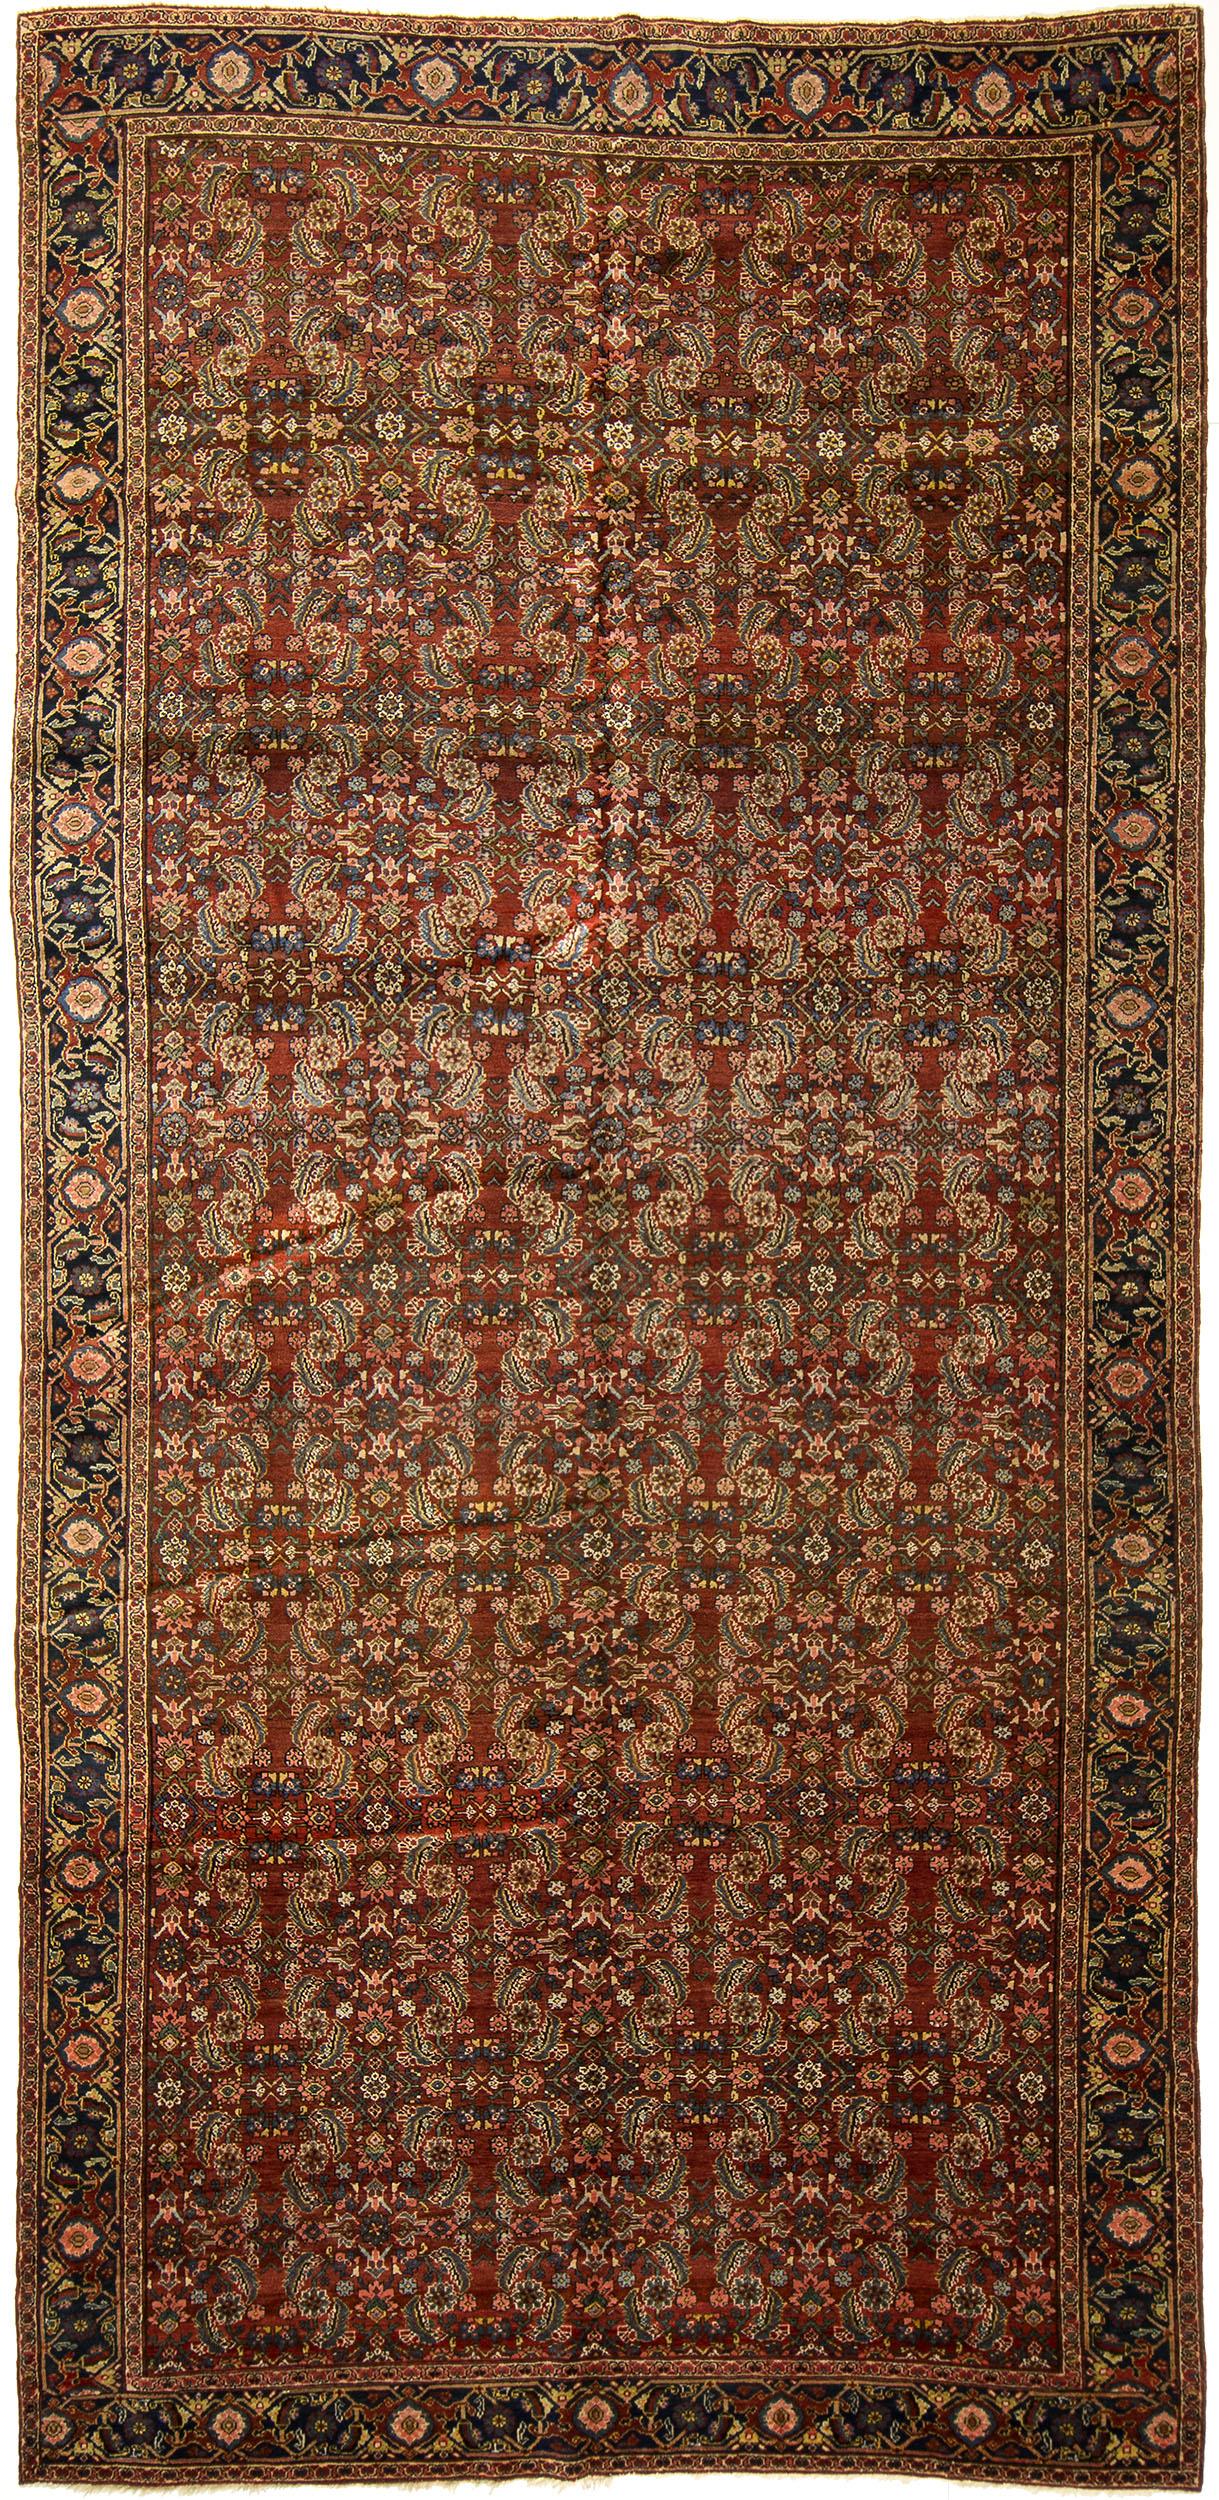 "Tabriz Gallery Carpet 15' 0"" x 7' 5"""